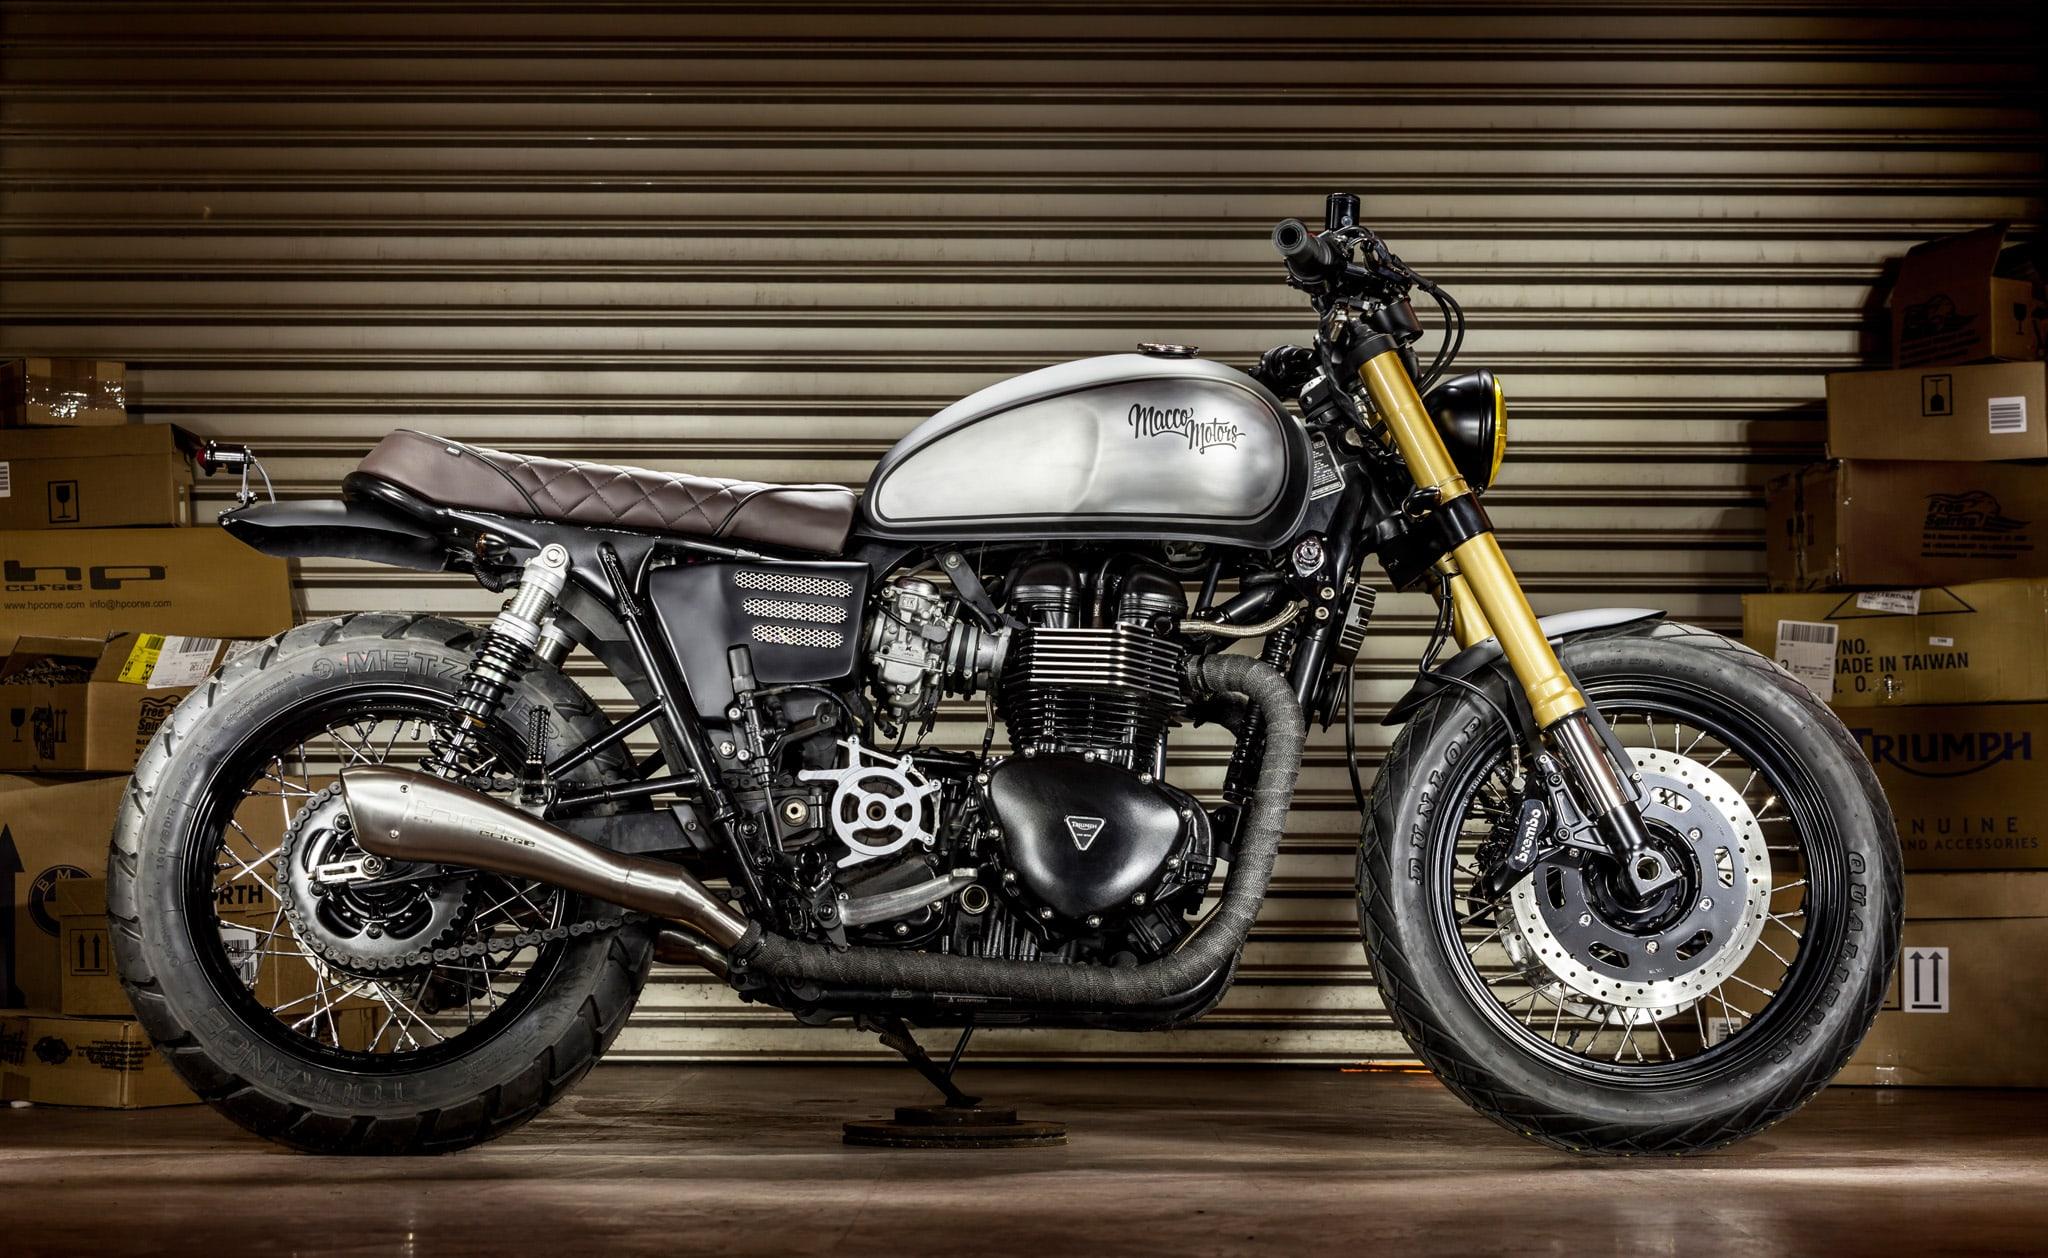 Triumph-Bonneville-The-Maltese-Falcon-Moto-Macco-Motors-Effronté-03-min